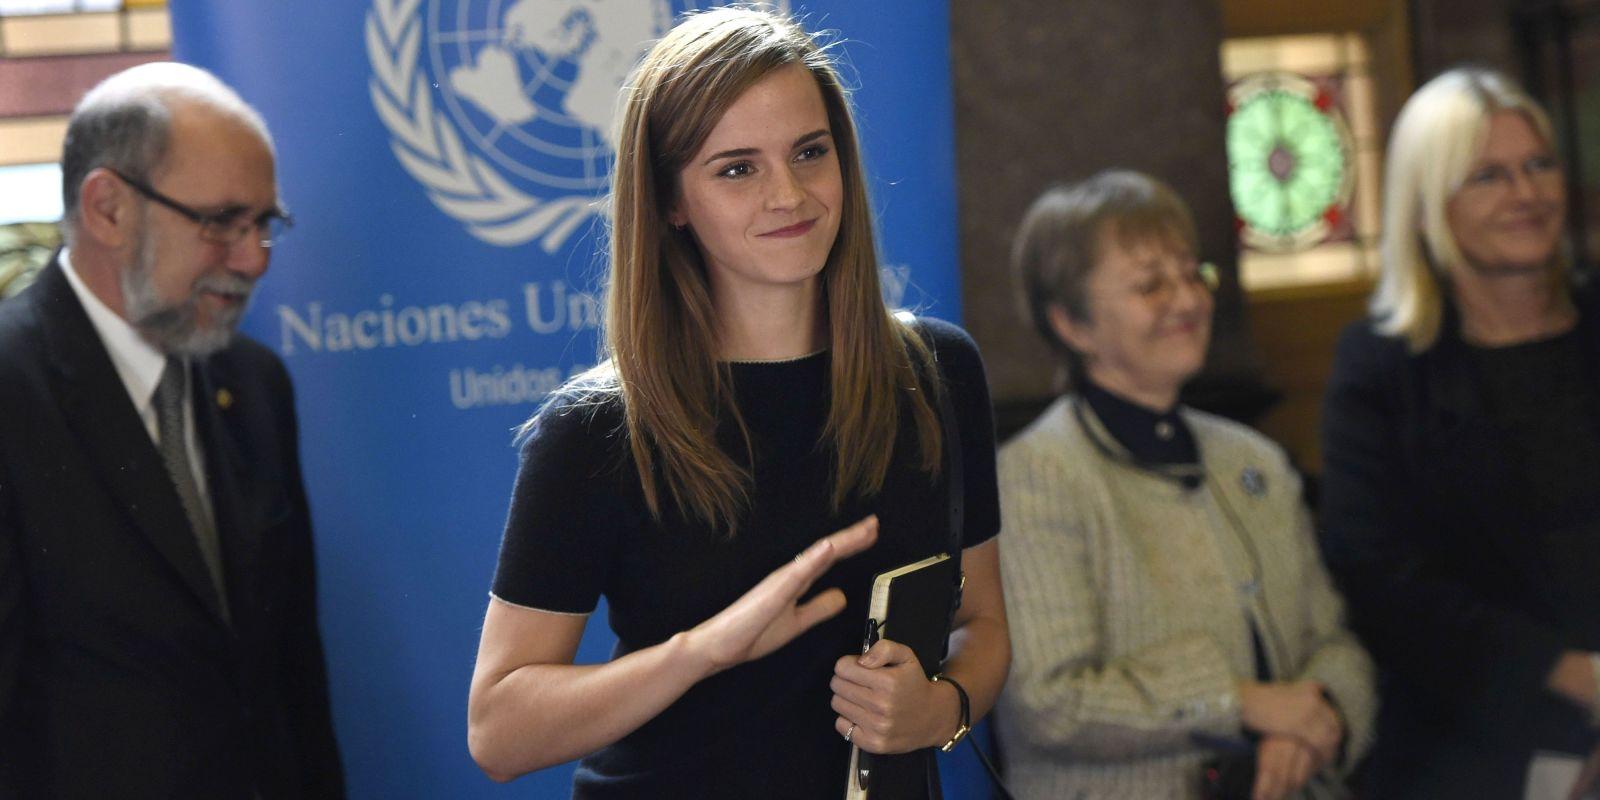 Emma Watson nude leak photo threat was anti-4chan PR hoax